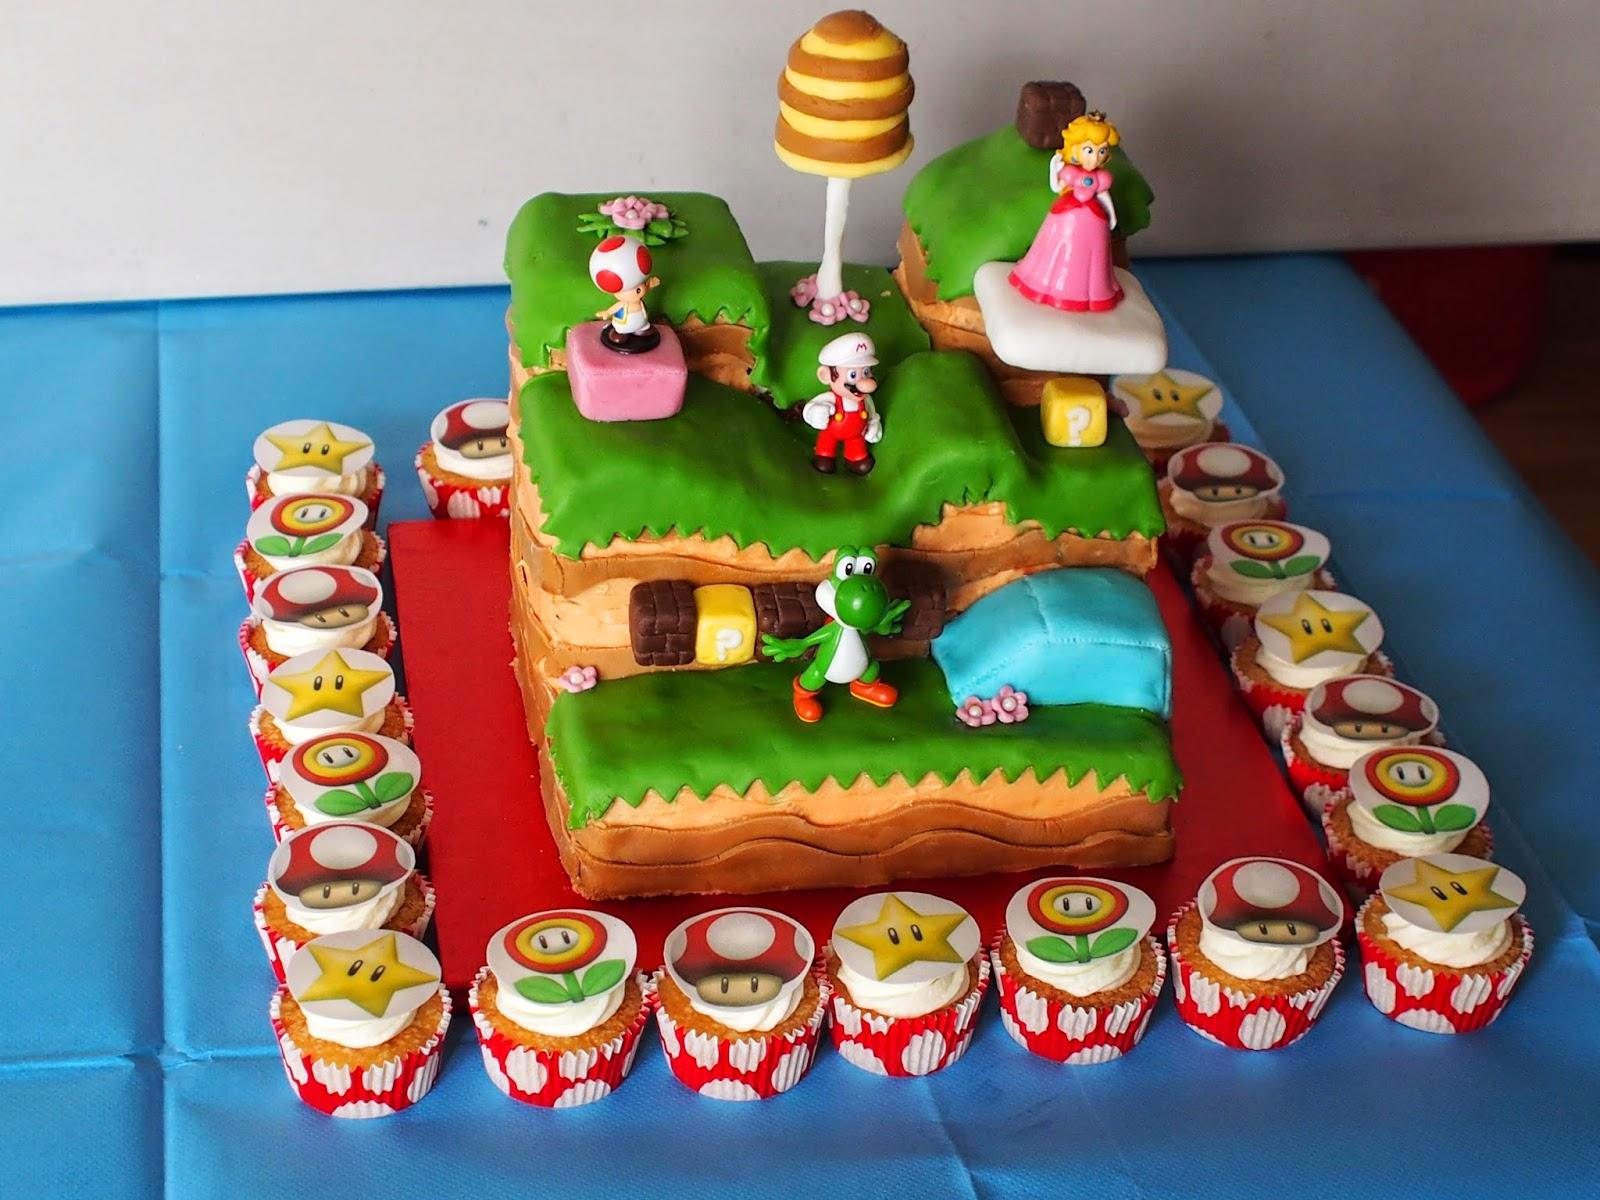 9 Hard Cakes Super Mario 3d World Photo Birthday Cake Super Mario